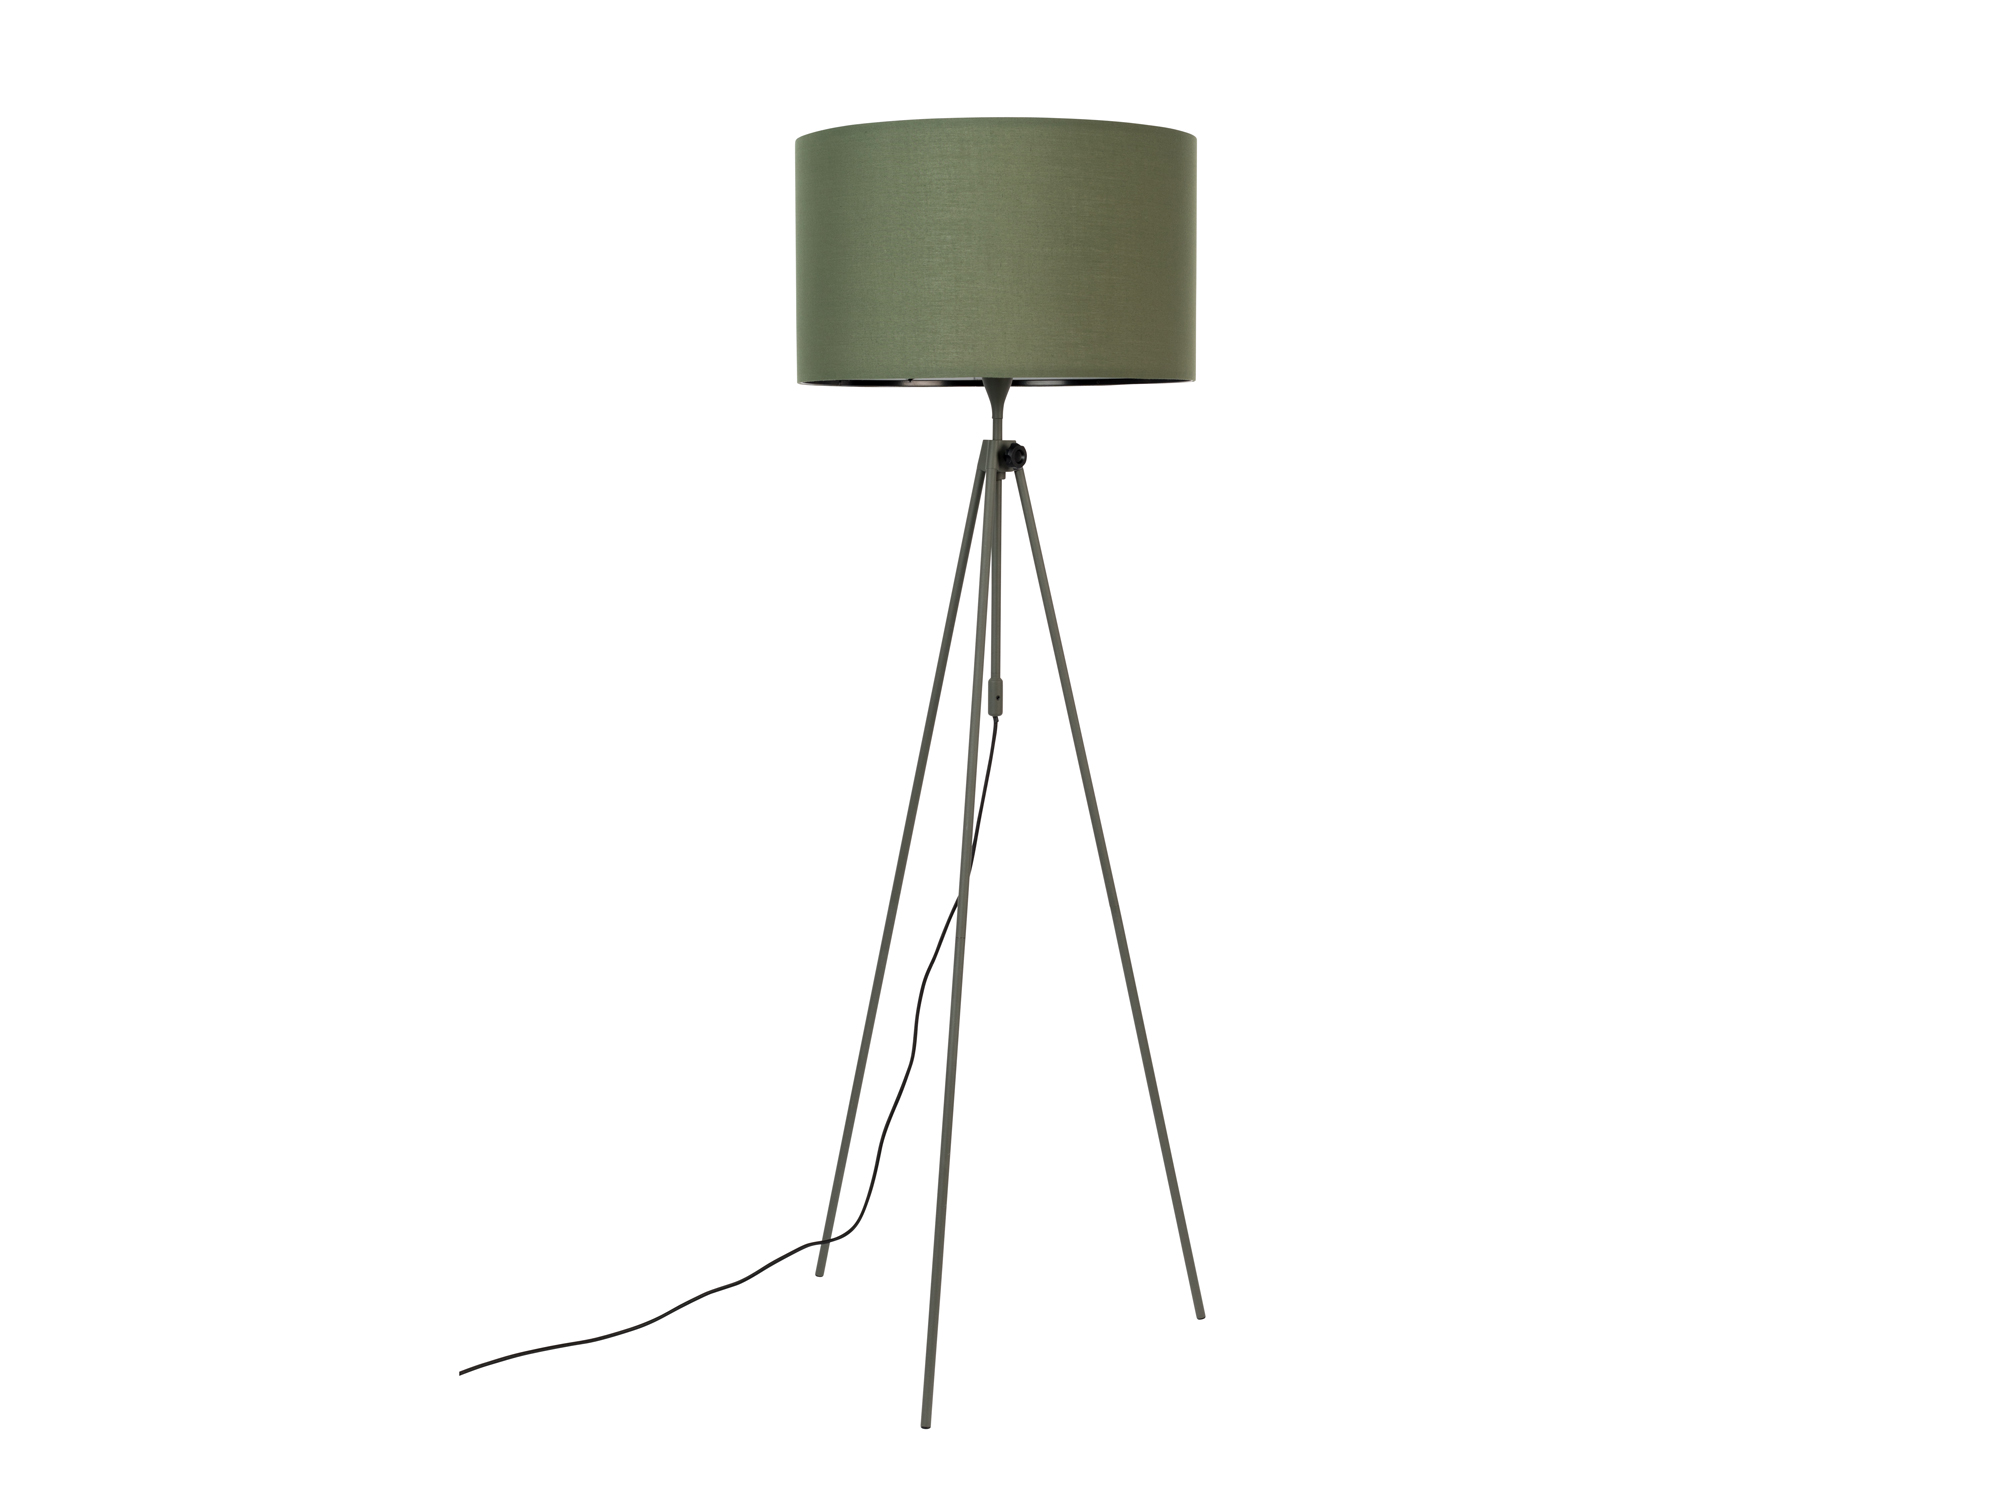 Vloerlamp \'Lesley\' - kleur: Green groen | DEBA Meubelen